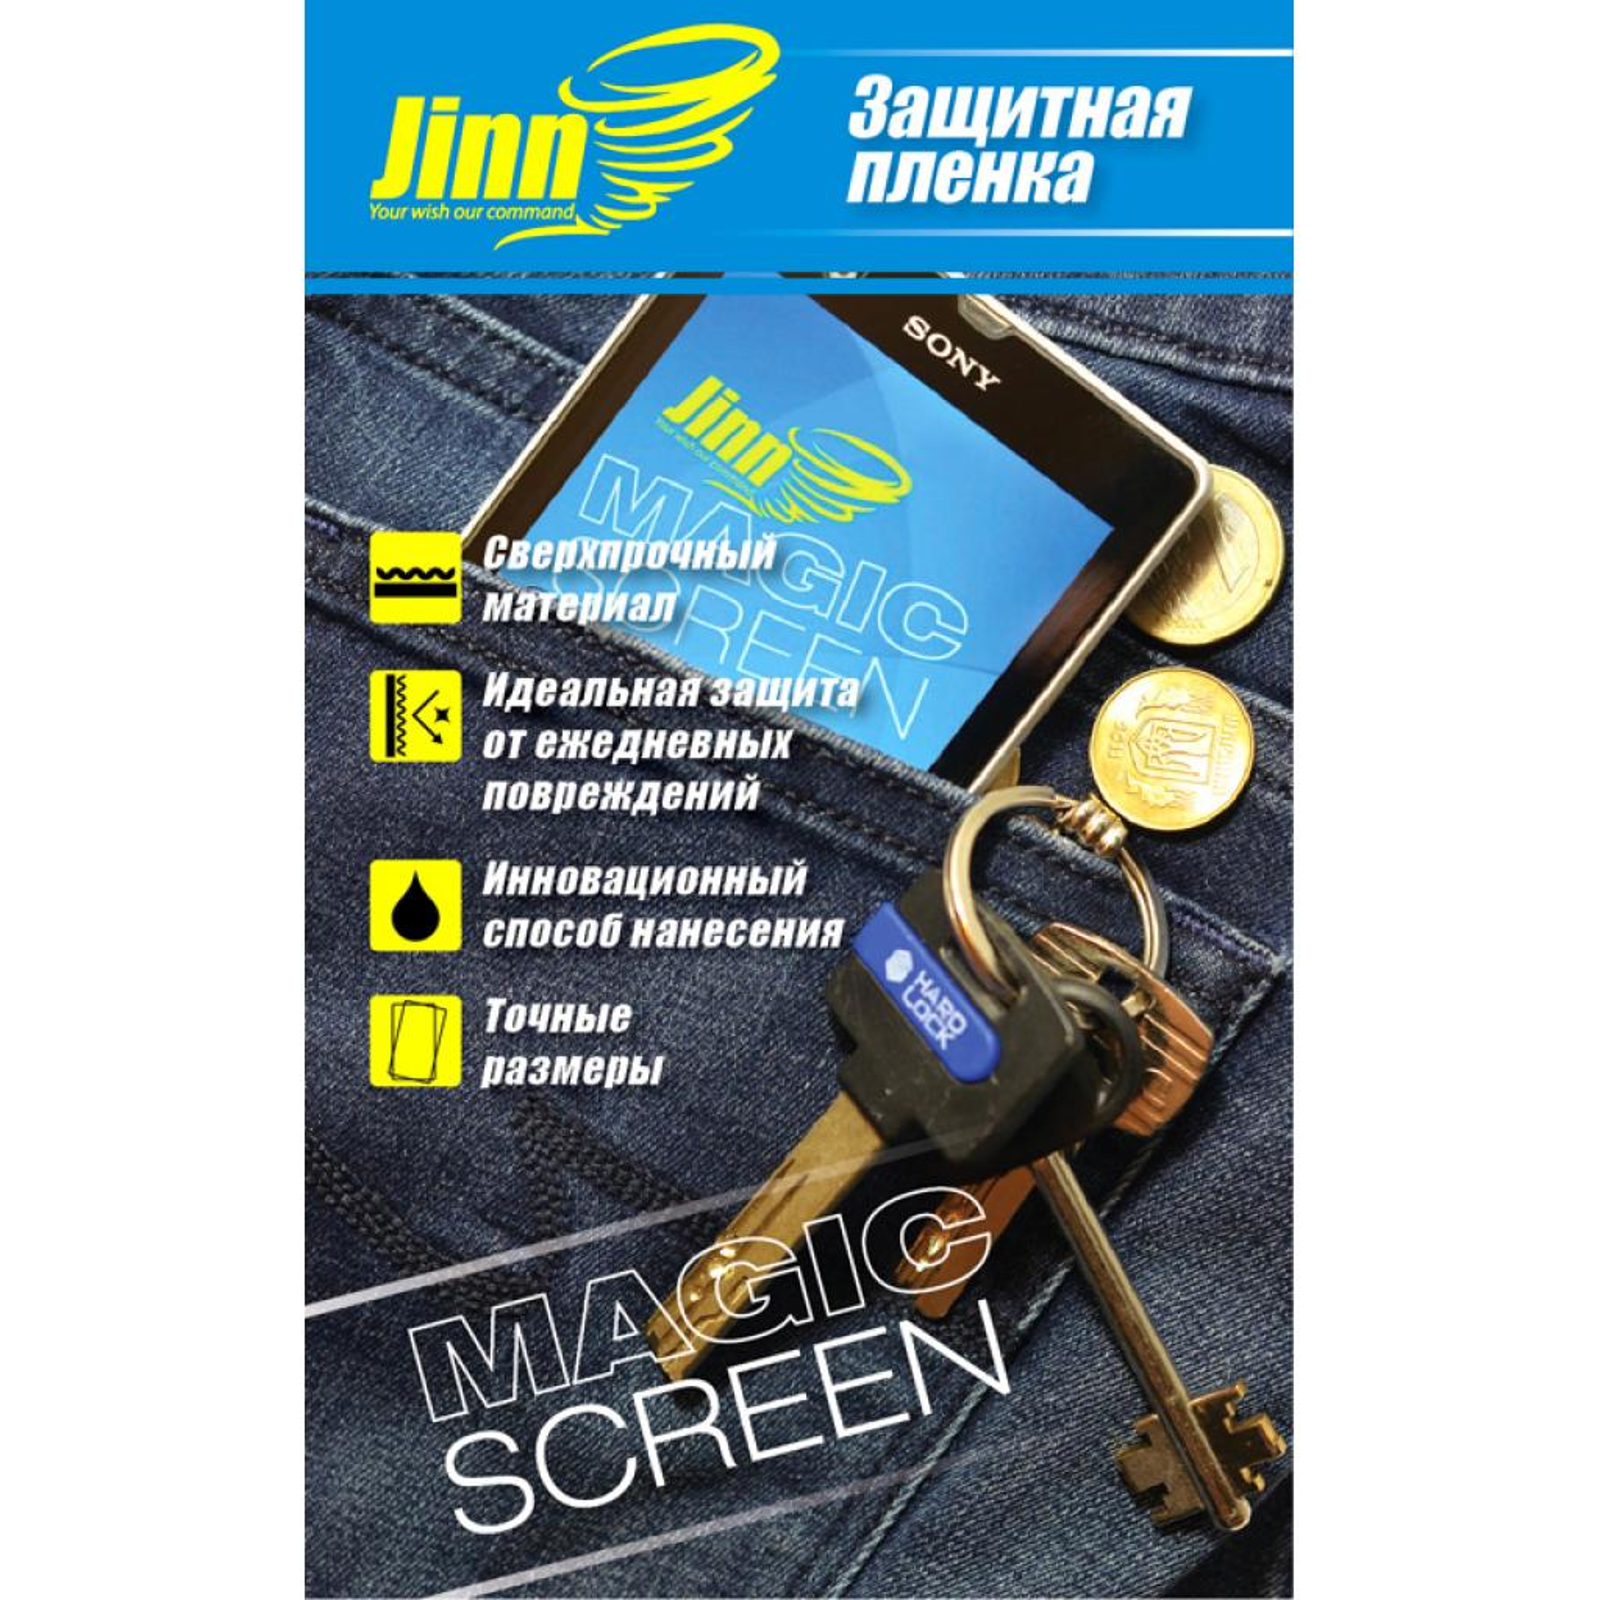 Пленка защитная JINN надміцна Magic Screen для Sony Xperia T LT30p (захист екрану (Sony Xperia T front)